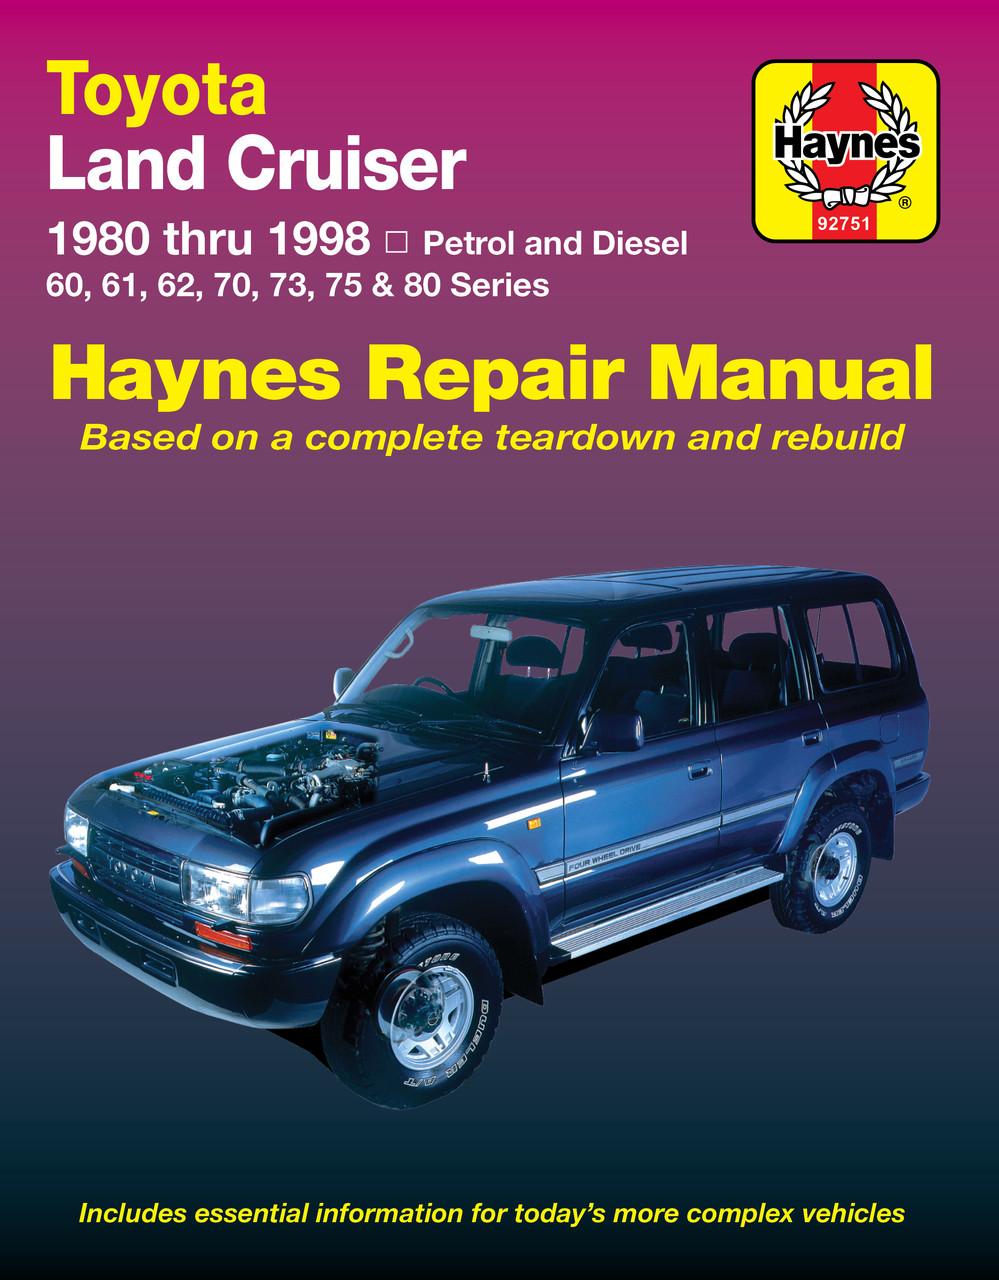 Toyota Land Cruiser Fj And Fzj Series Petrol Diesel 1980 1998 Fj55 Wiring Diagram Amp Workshop